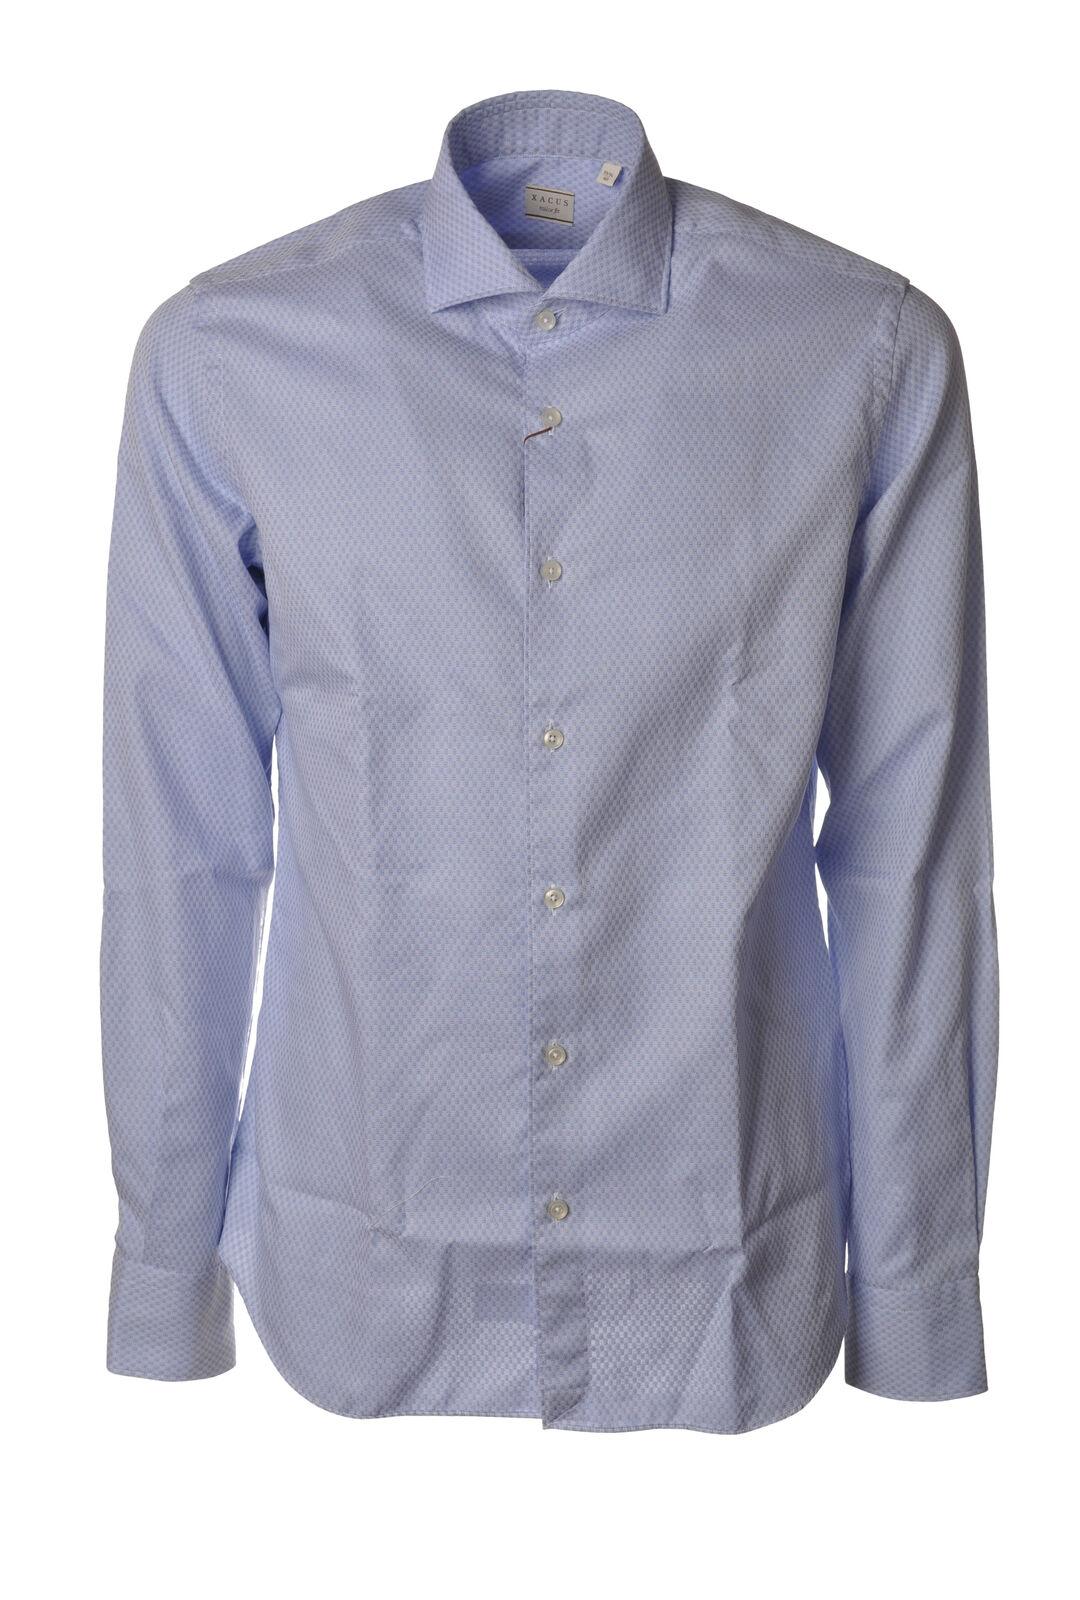 Xacus - T-shirts-Hemden-hals-frankreich - Mann - Blau - 6059323F191416